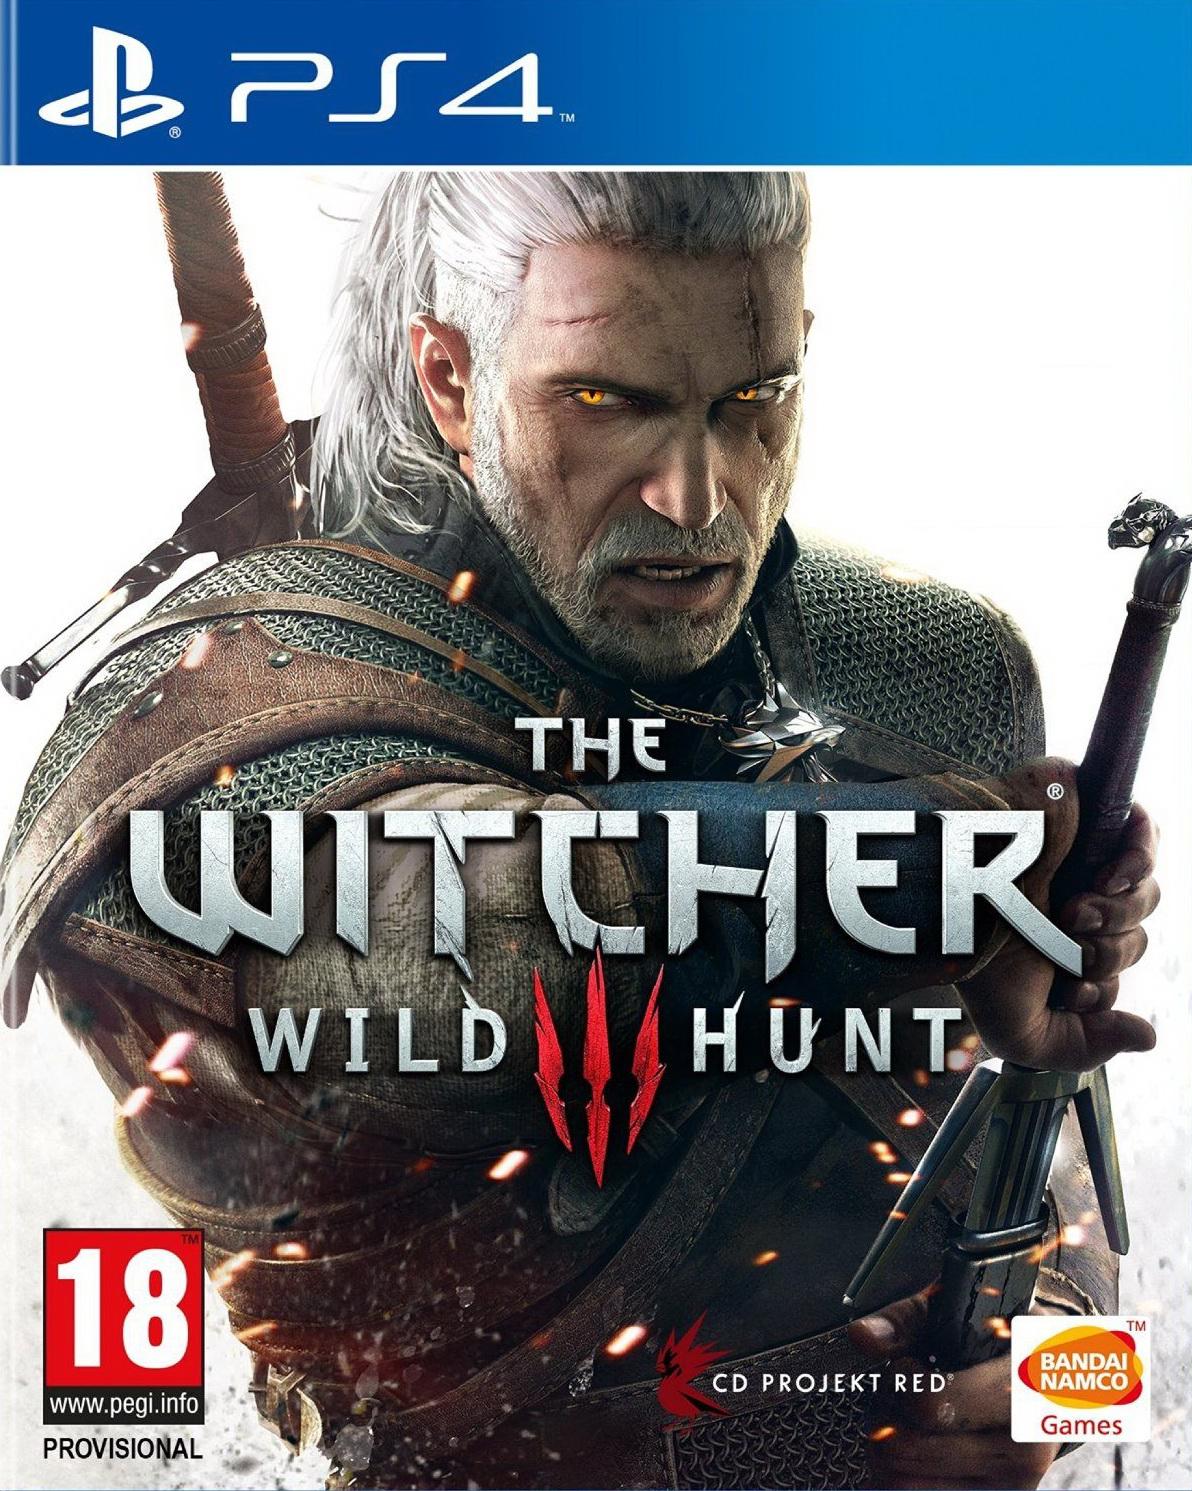 The Witcher 3 Wild Hunt sur PS4